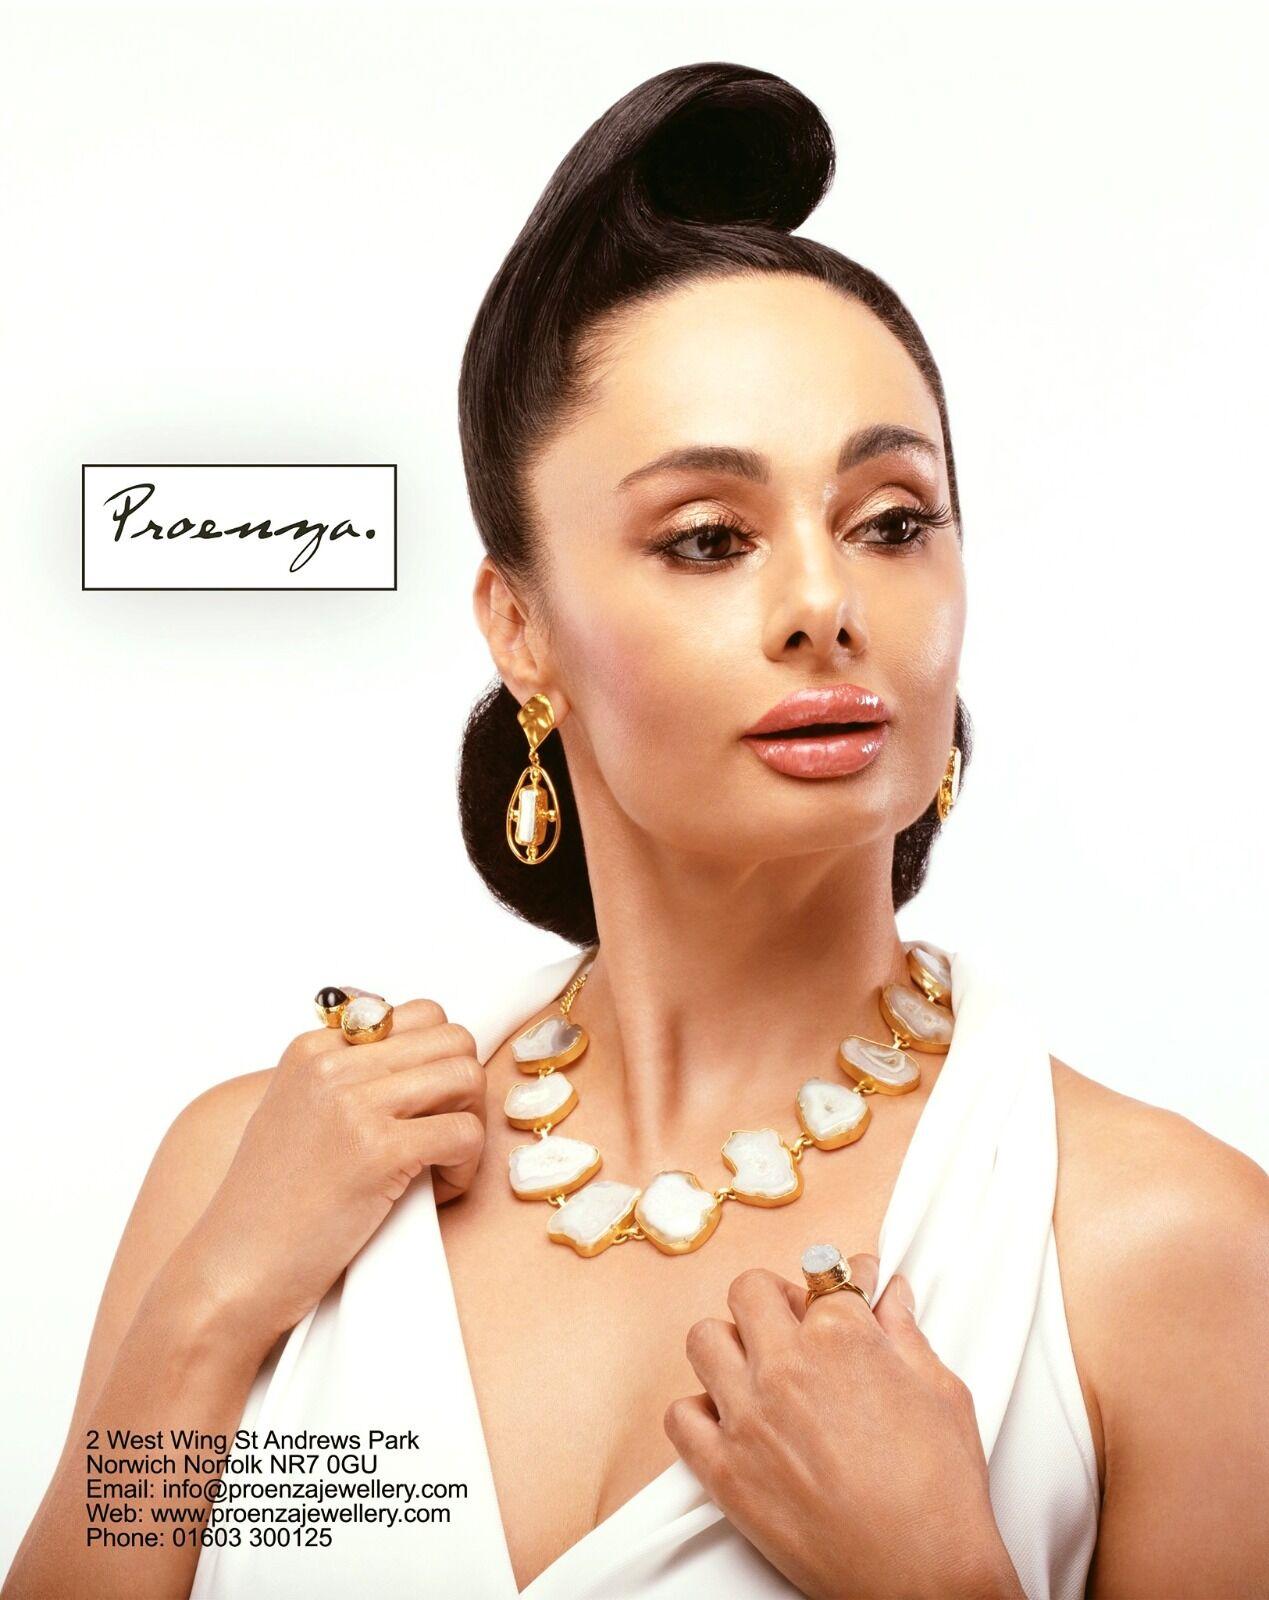 JWM Jewellery Magazine - Proenza Jewellery